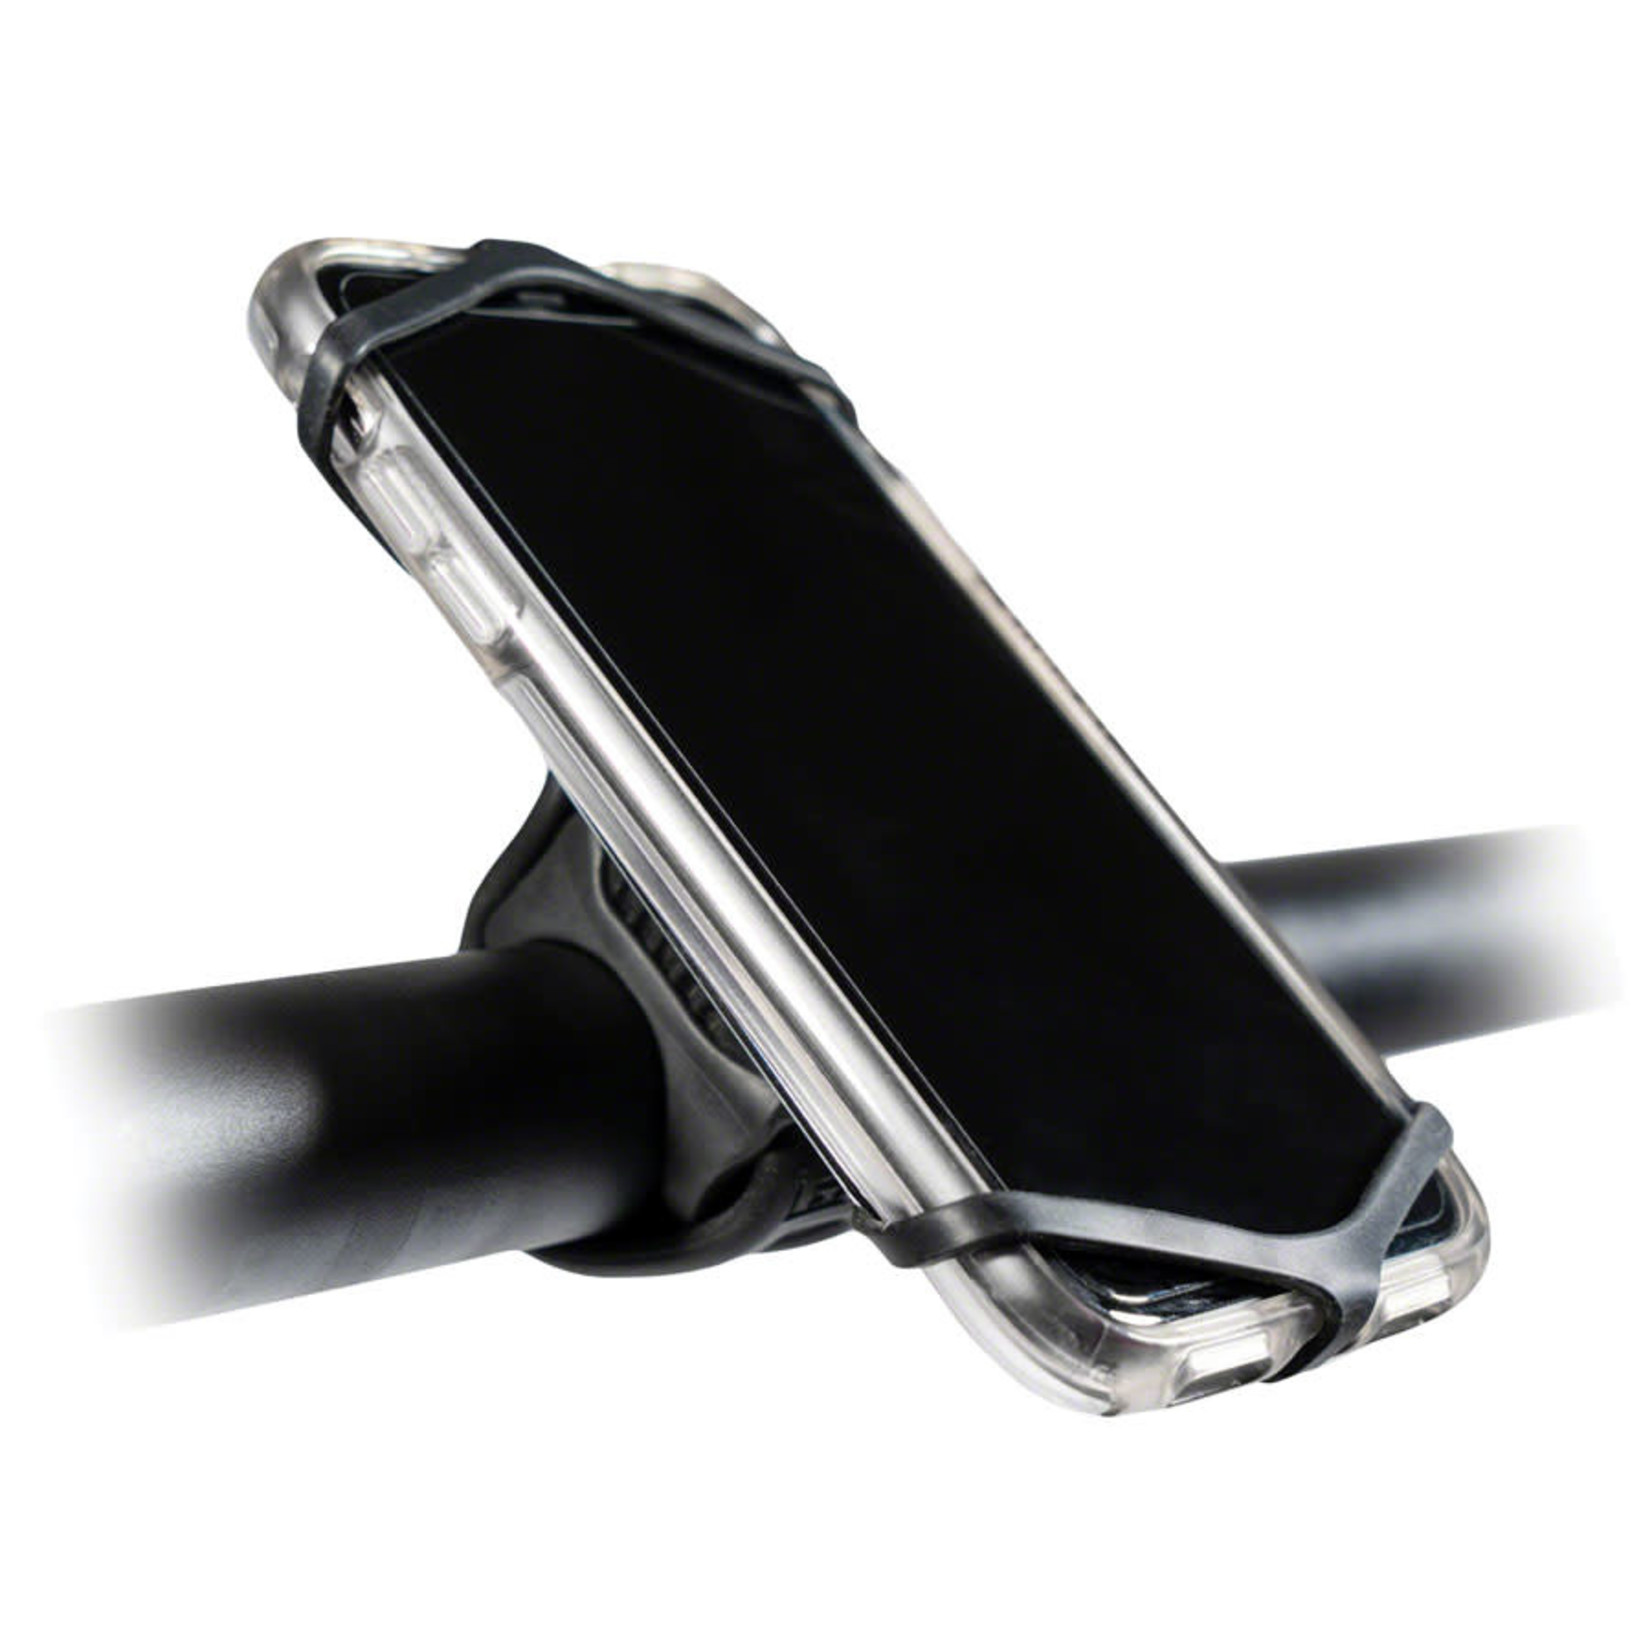 LEZYNE Lezyne Smart Grip Mount Phone Holder